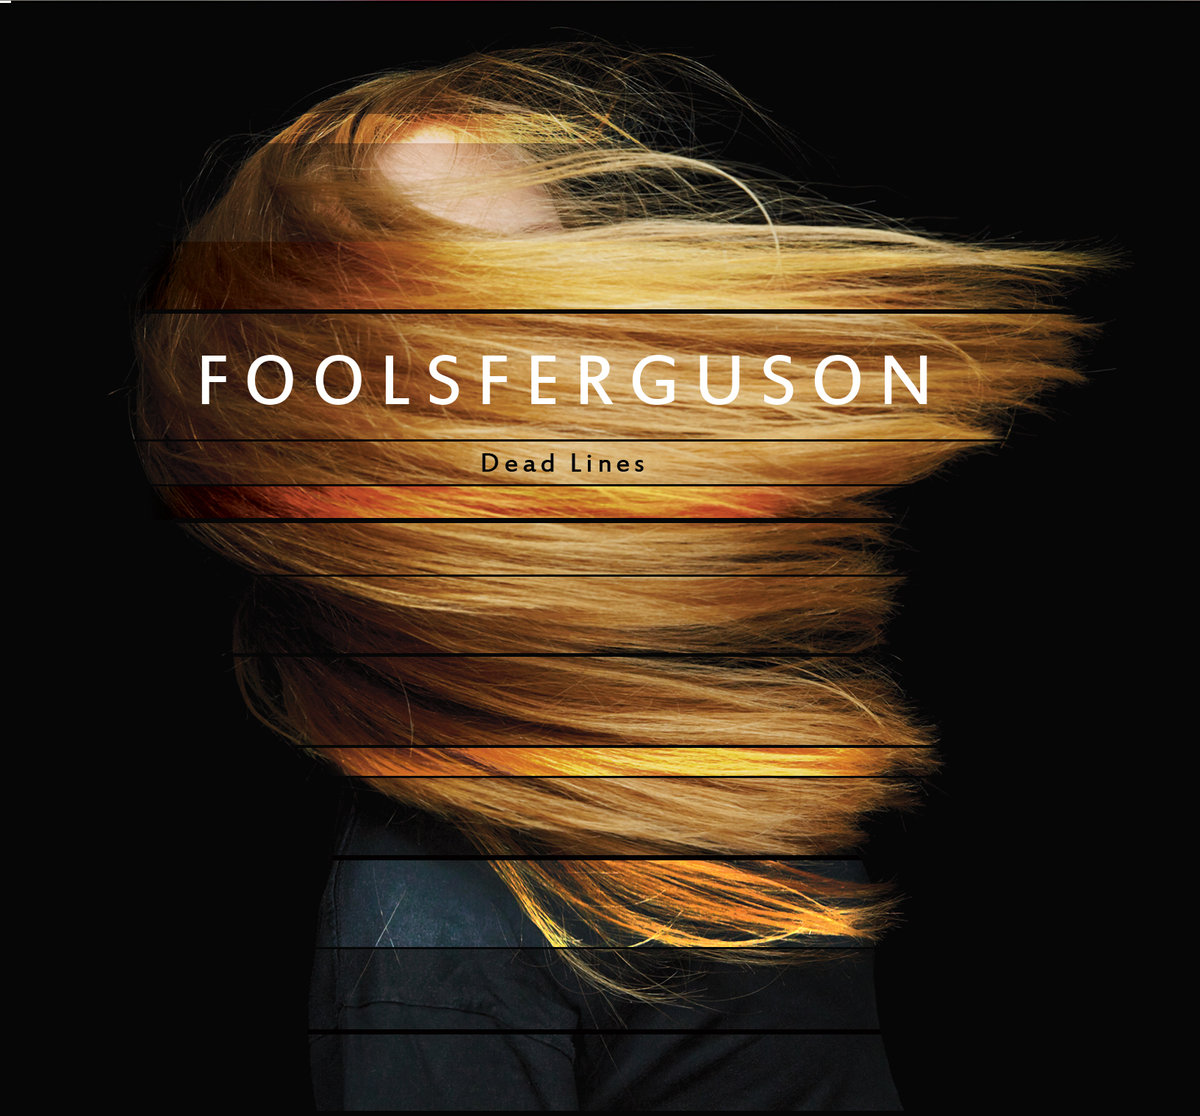 Fools Ferguson - Dead Lines